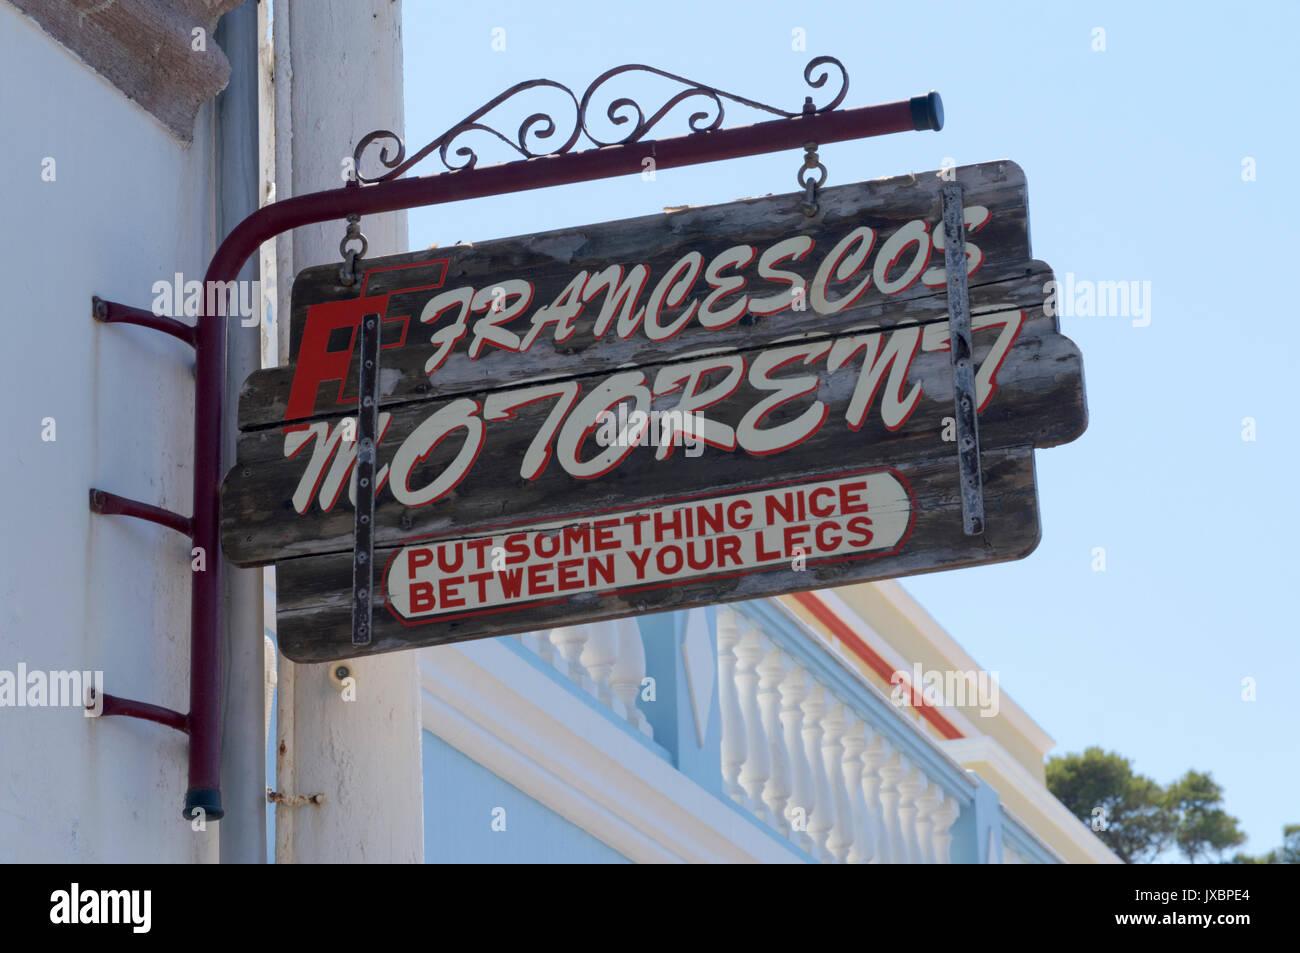 Sign for Moto rental Francescos company, Aghia Marina, Leros, Greece. - Stock Image